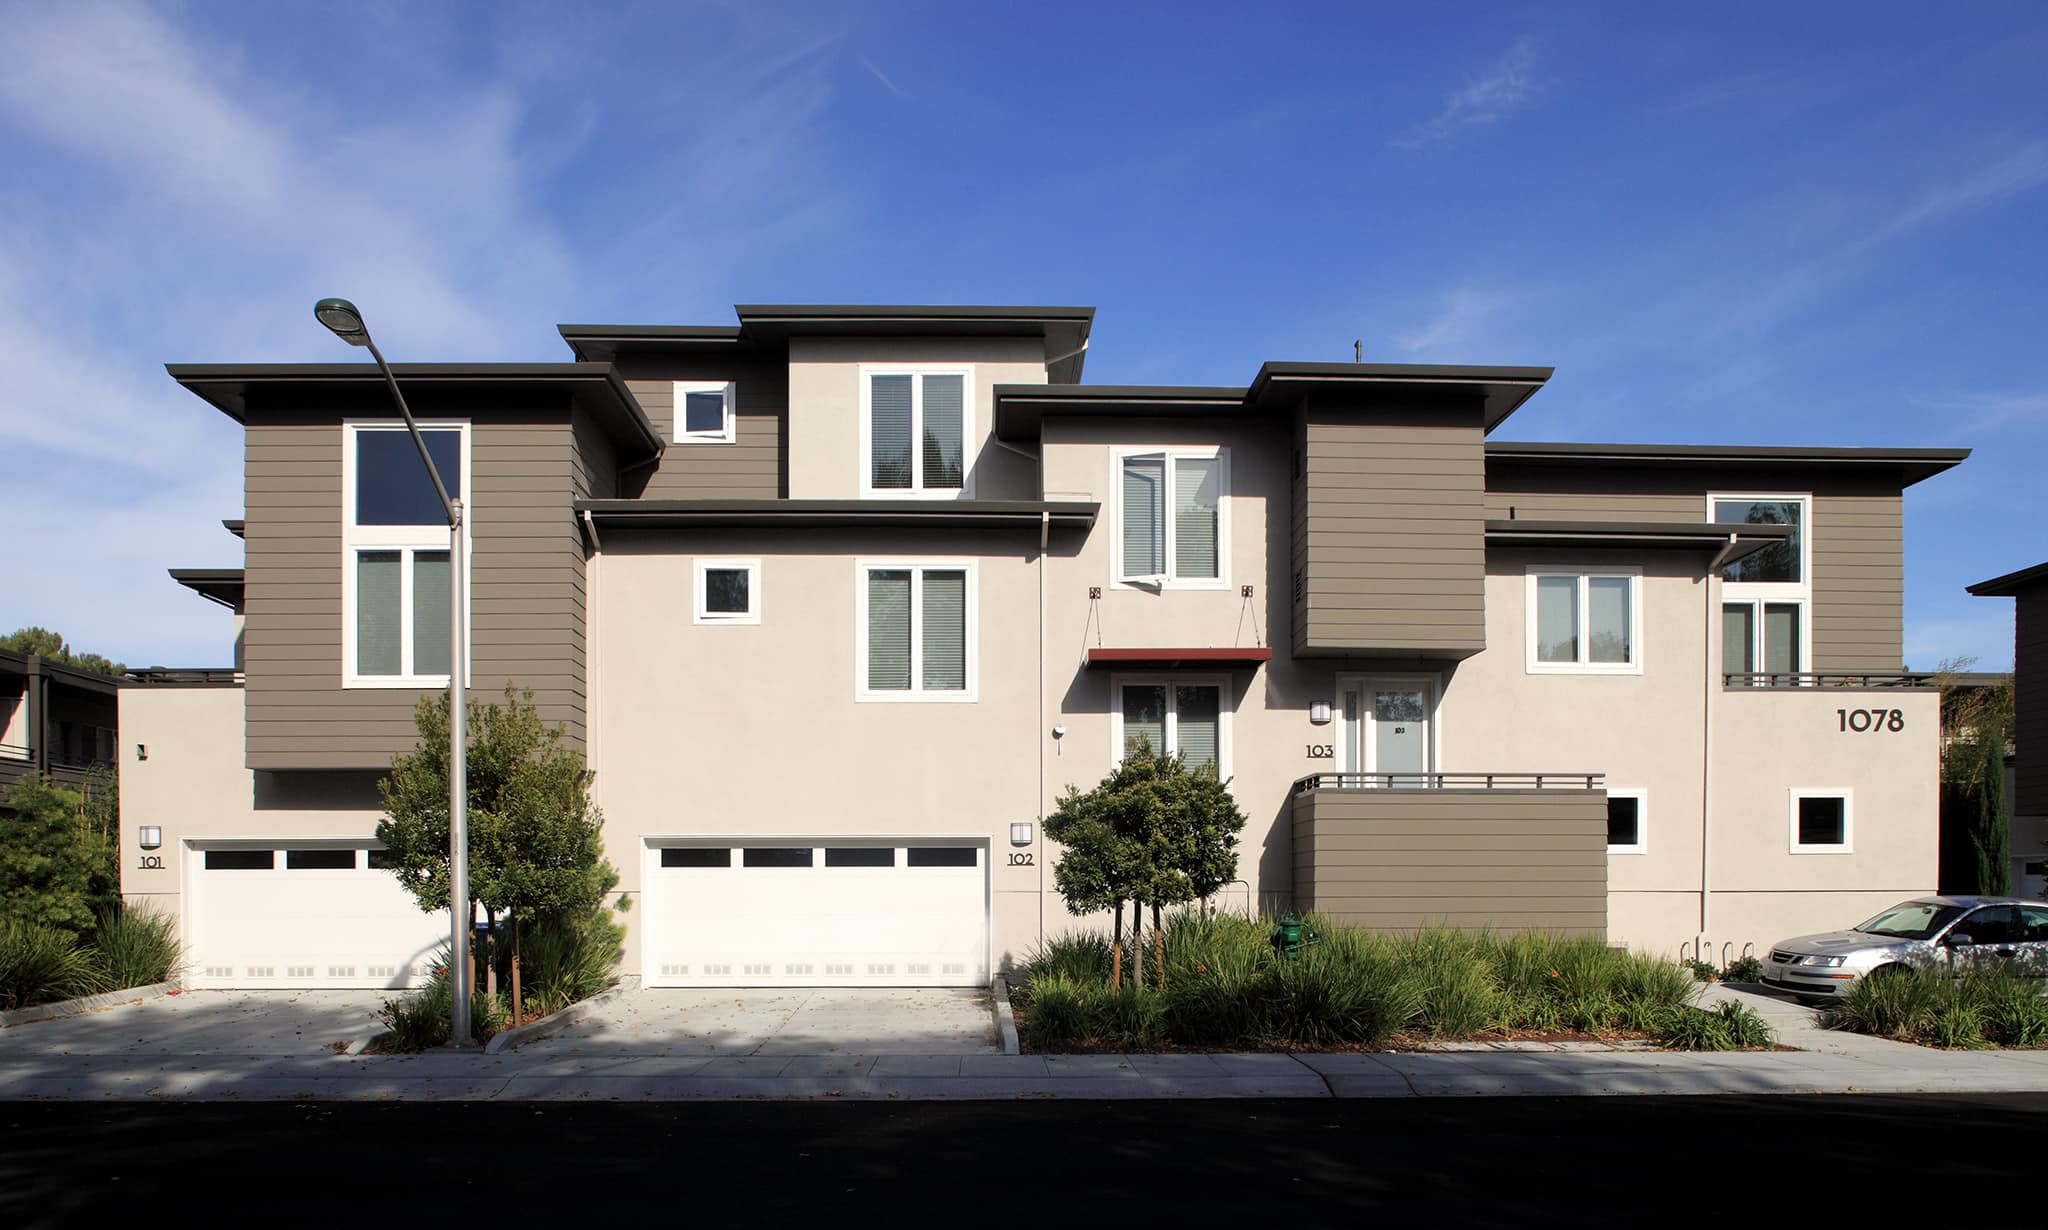 Parker Palo Alto Apartments apartments in Palo Alto CA to rent photo 1